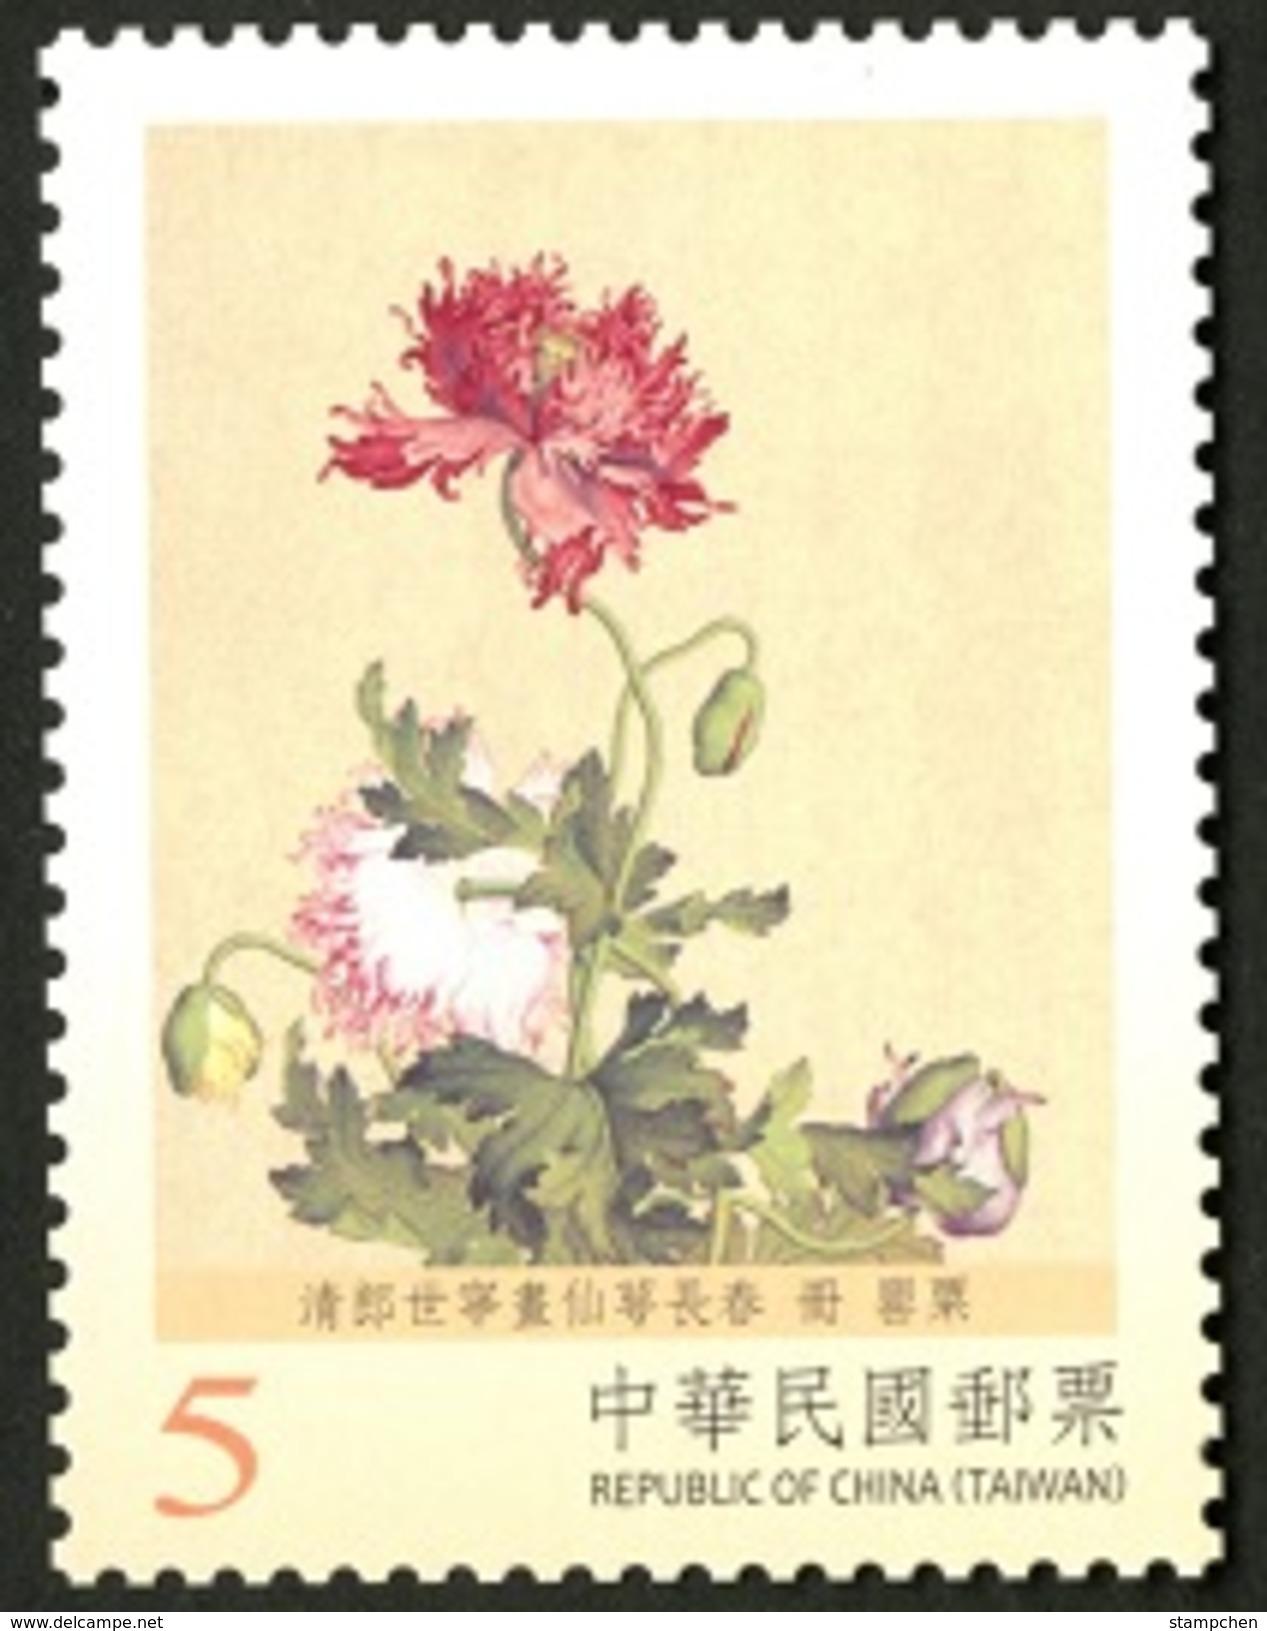 2017 Ancient Chinese Painting Stamp-Poppy Flower Opium Drug Medicine - Drugs